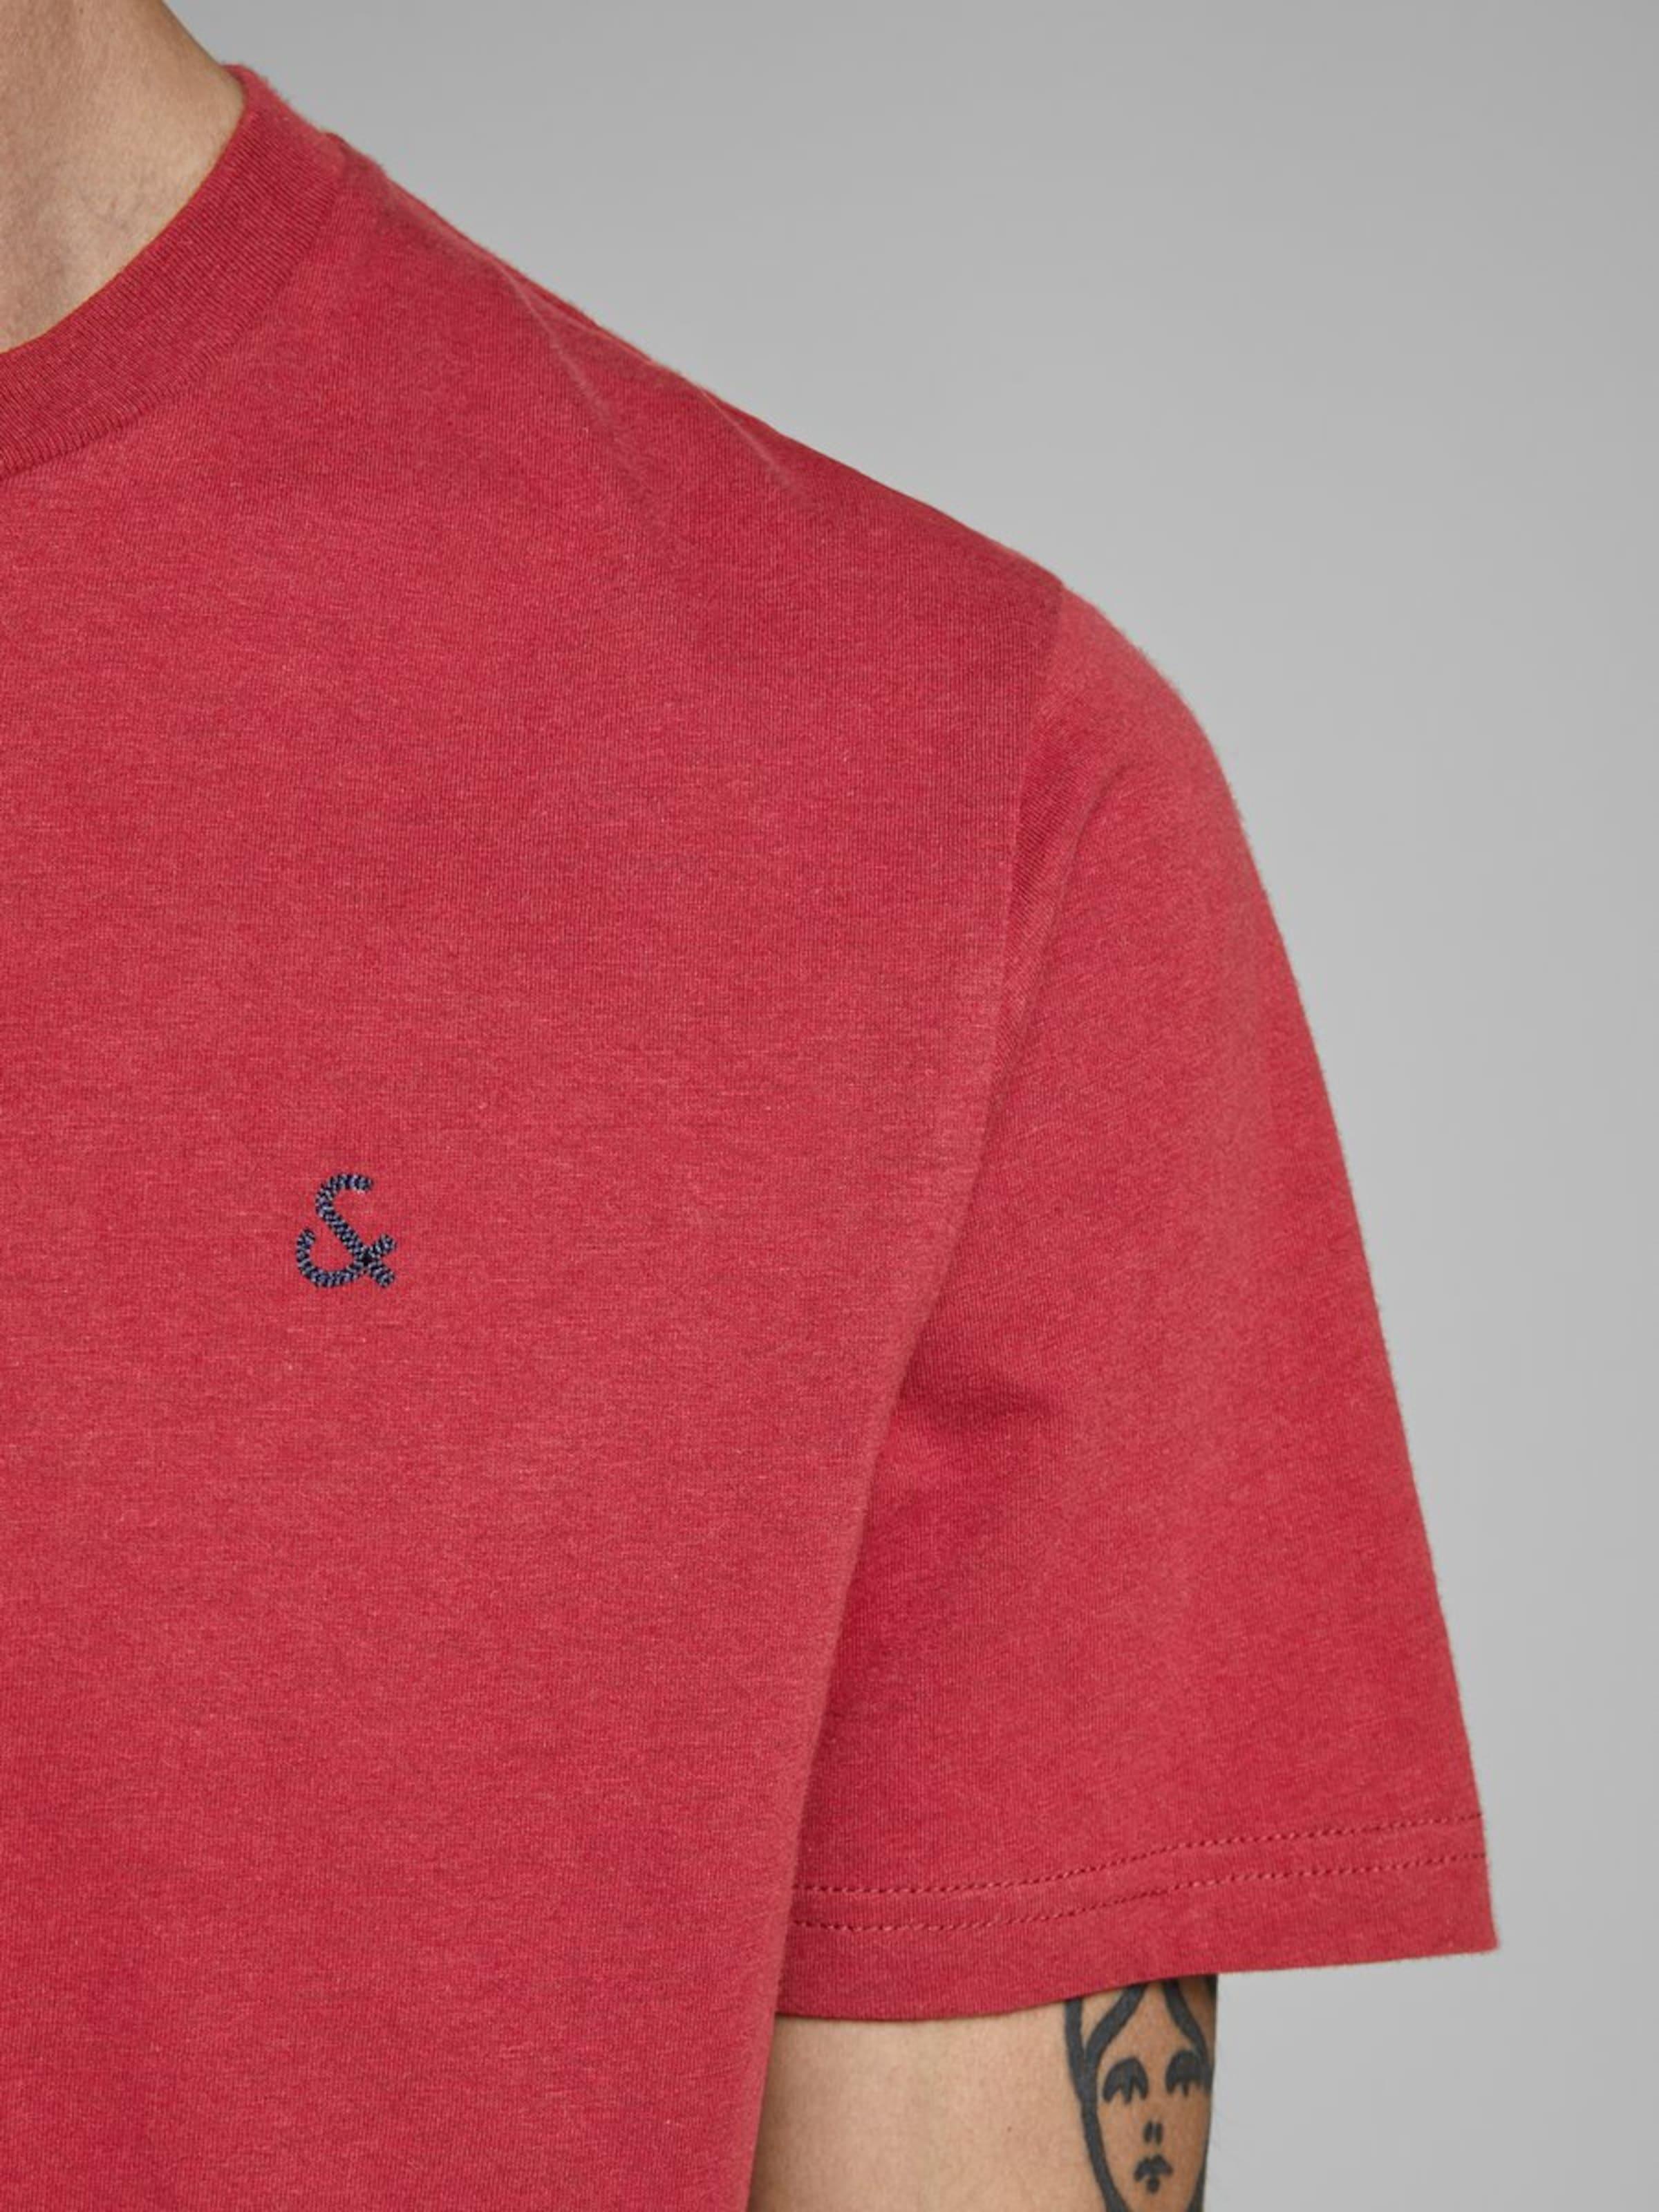 Jackamp; T Jones Rouge En shirt QdxChrts